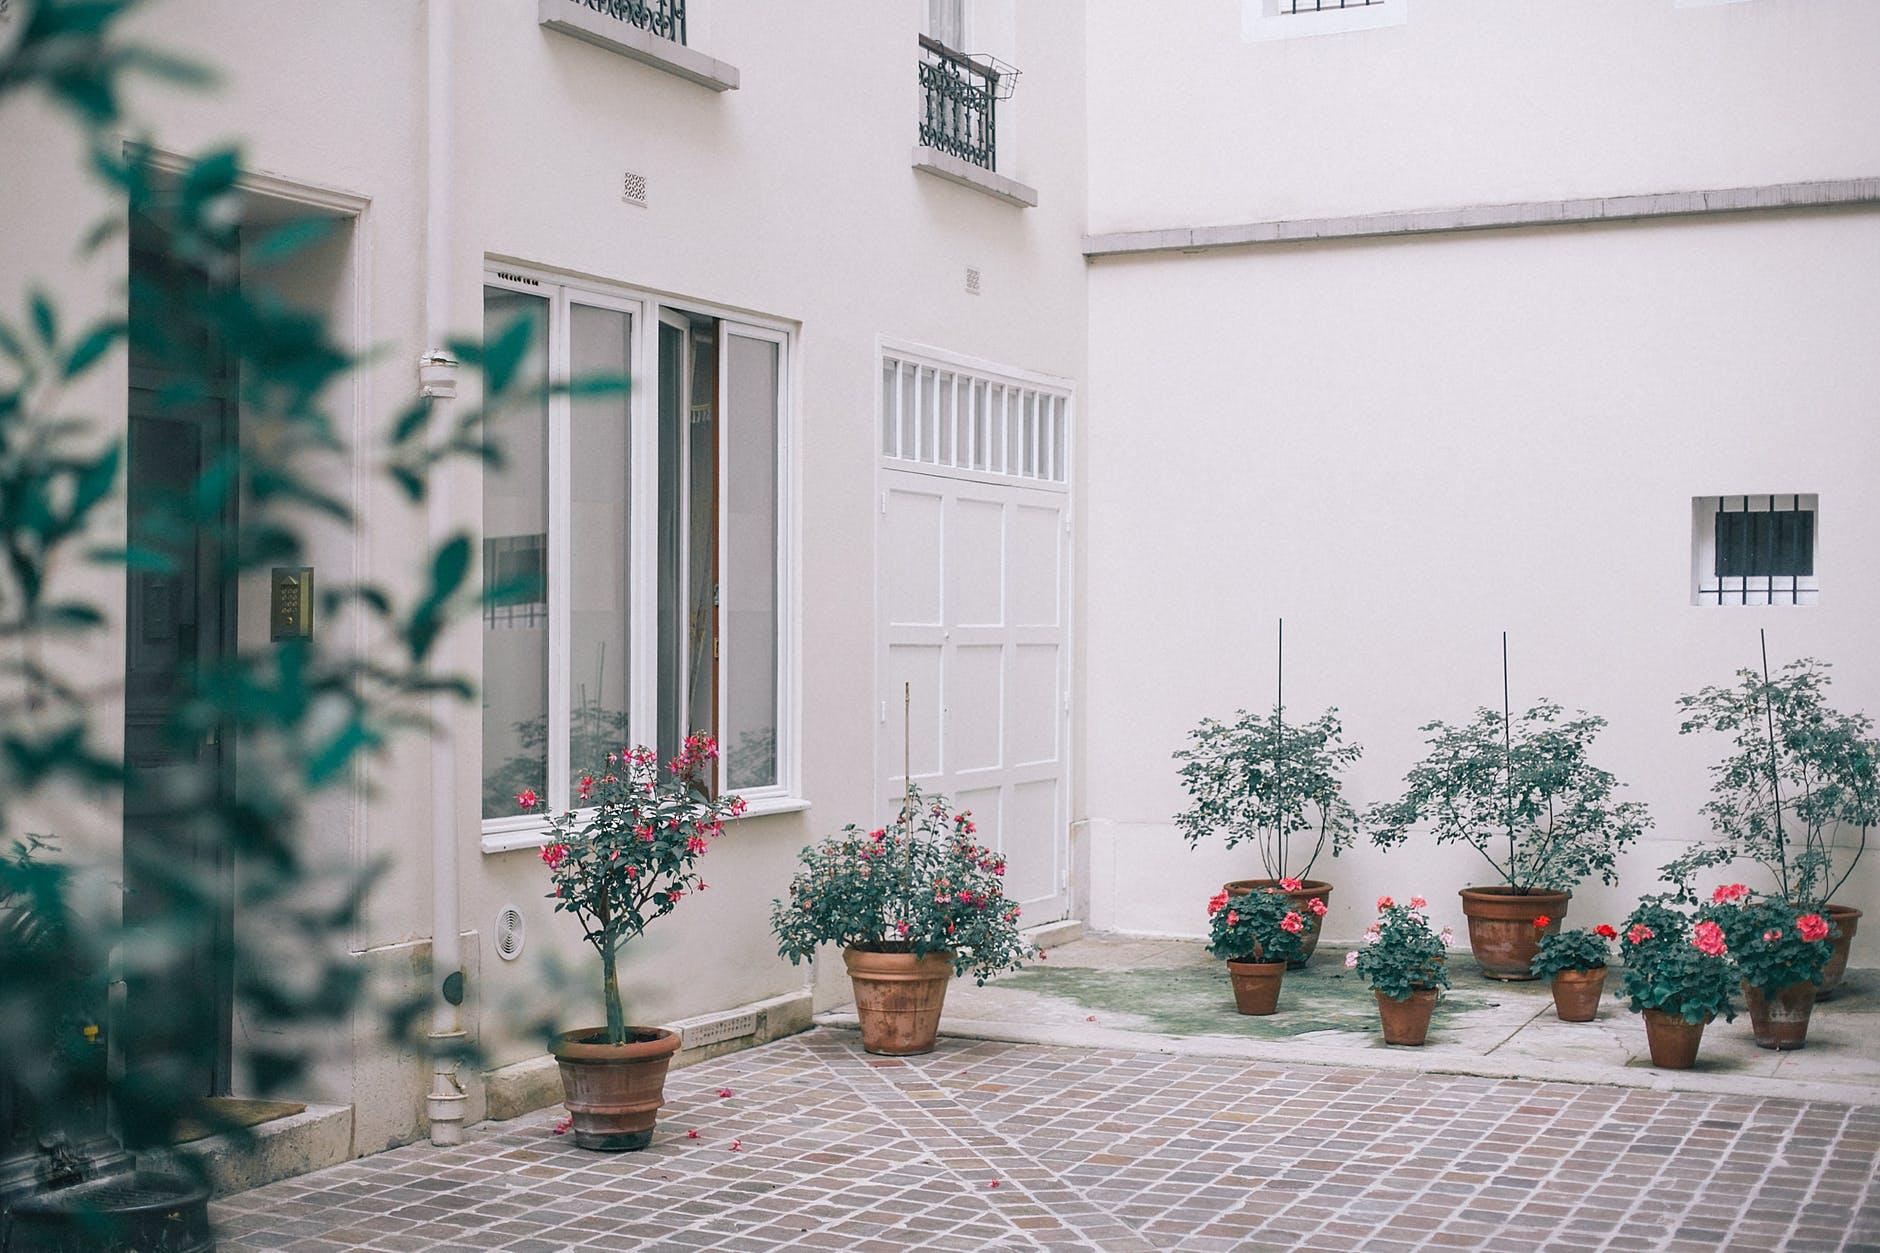 House decorated with potted flowers and plants. 7 Tips Sehat Bersih-bersih Rumah di Masa Pandemi